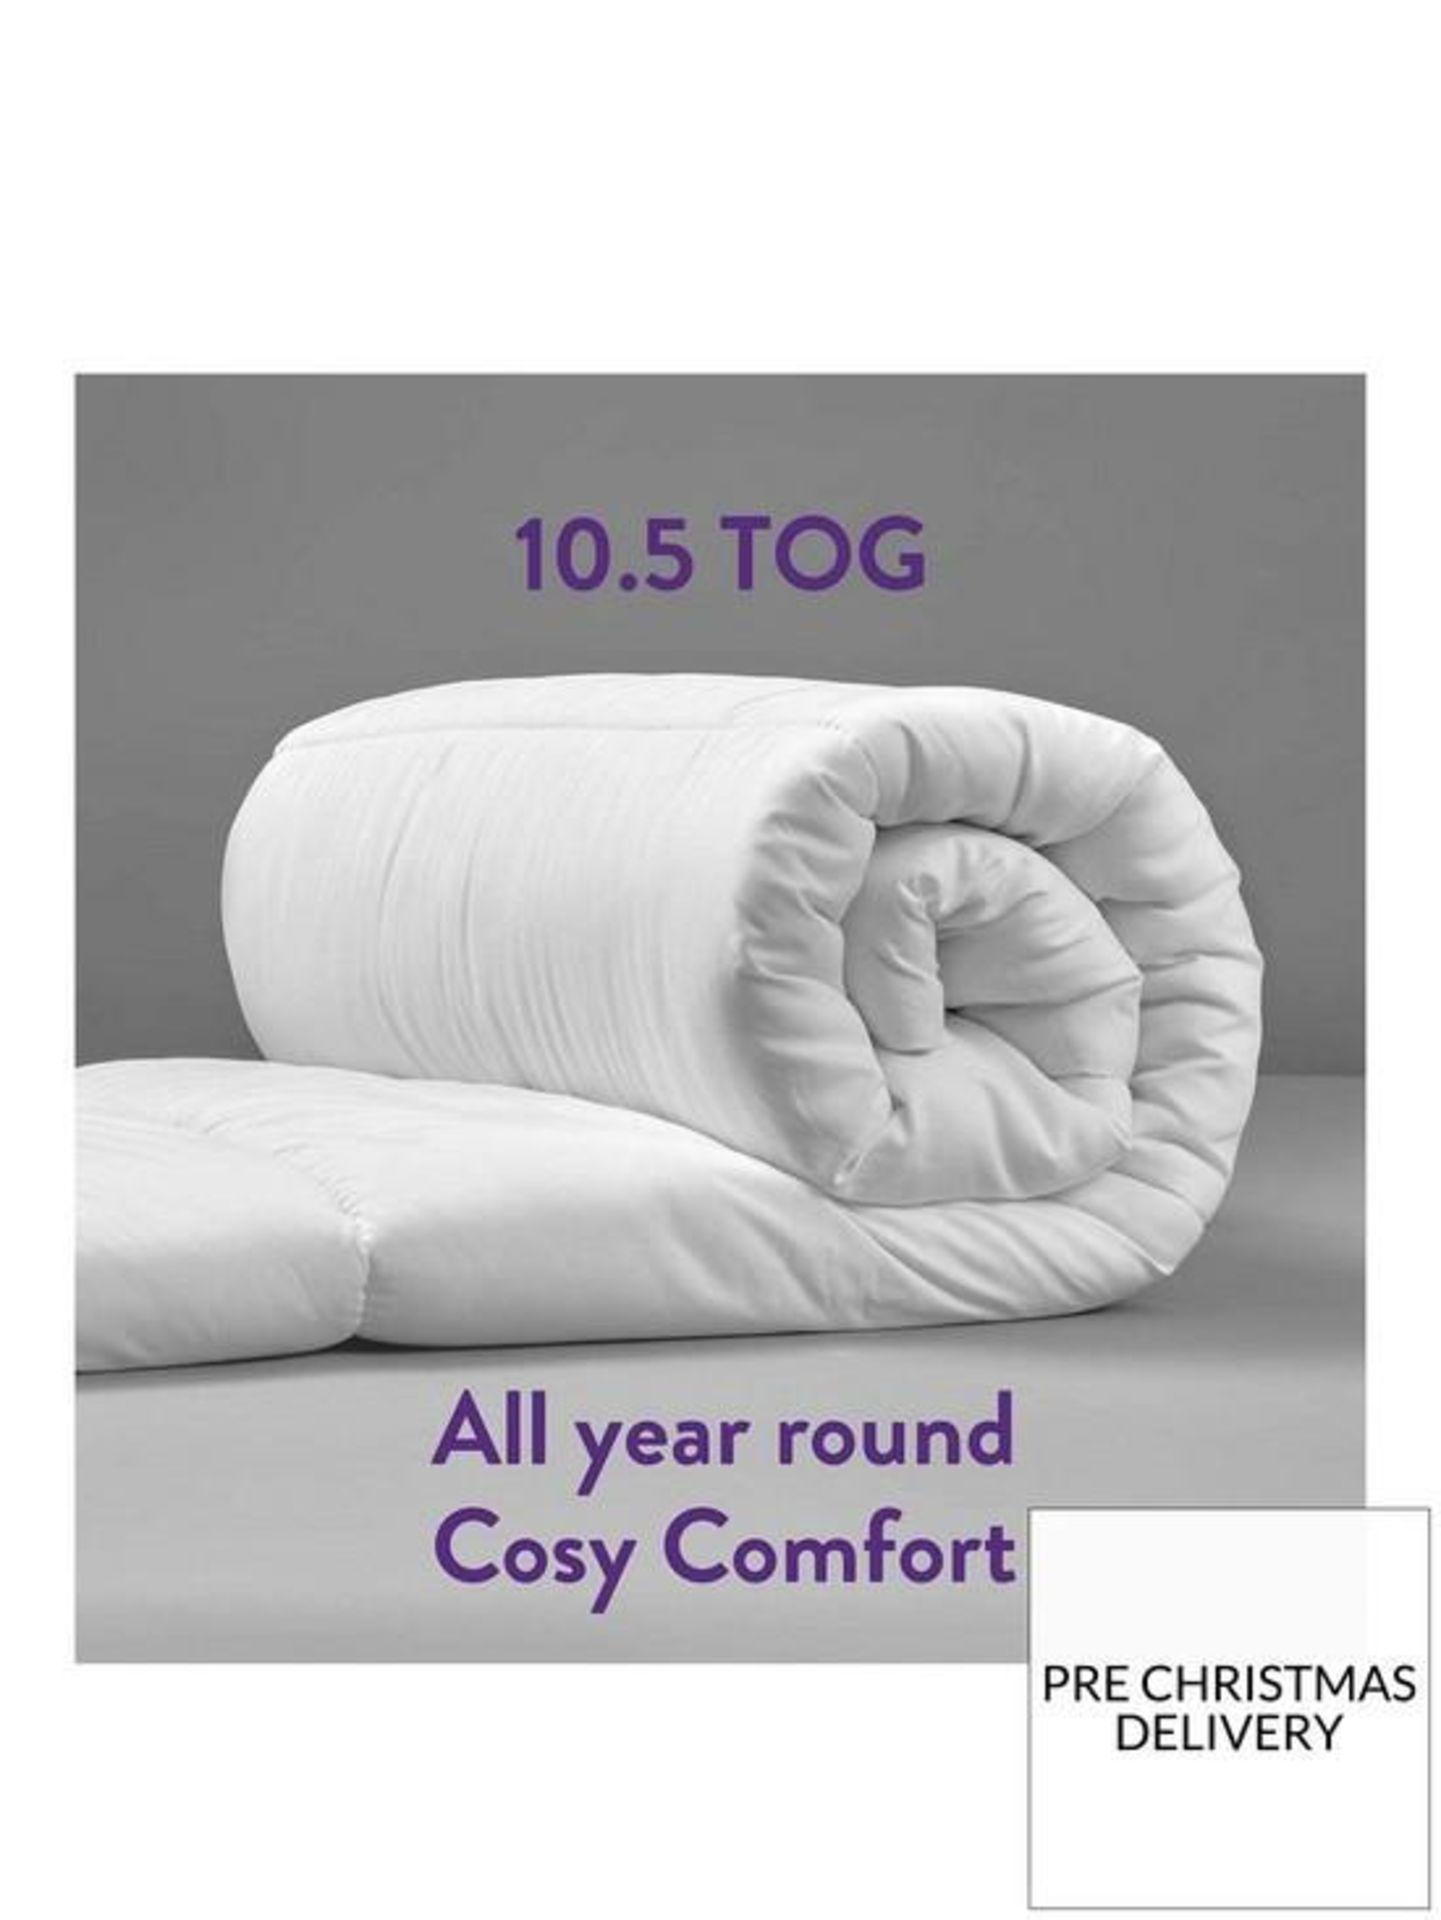 Slumberdown Climate Control King Size Duvet 10.5 Tog All Seasons Duvet King Size (5012924038323)